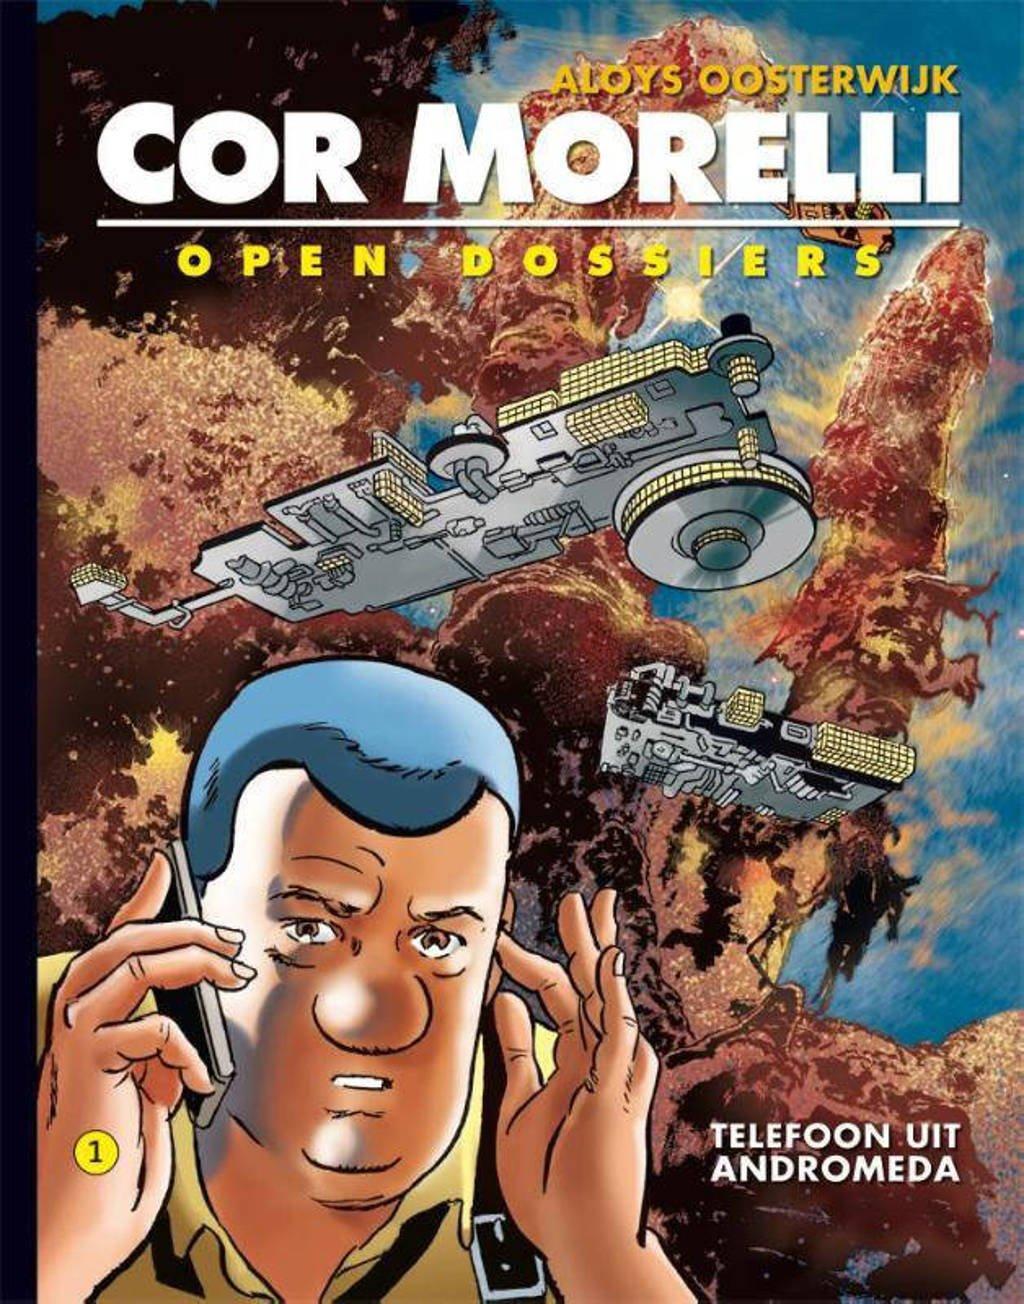 Cor Morelli: Telefoon uit Andromeda - Aloys Oosterwijk